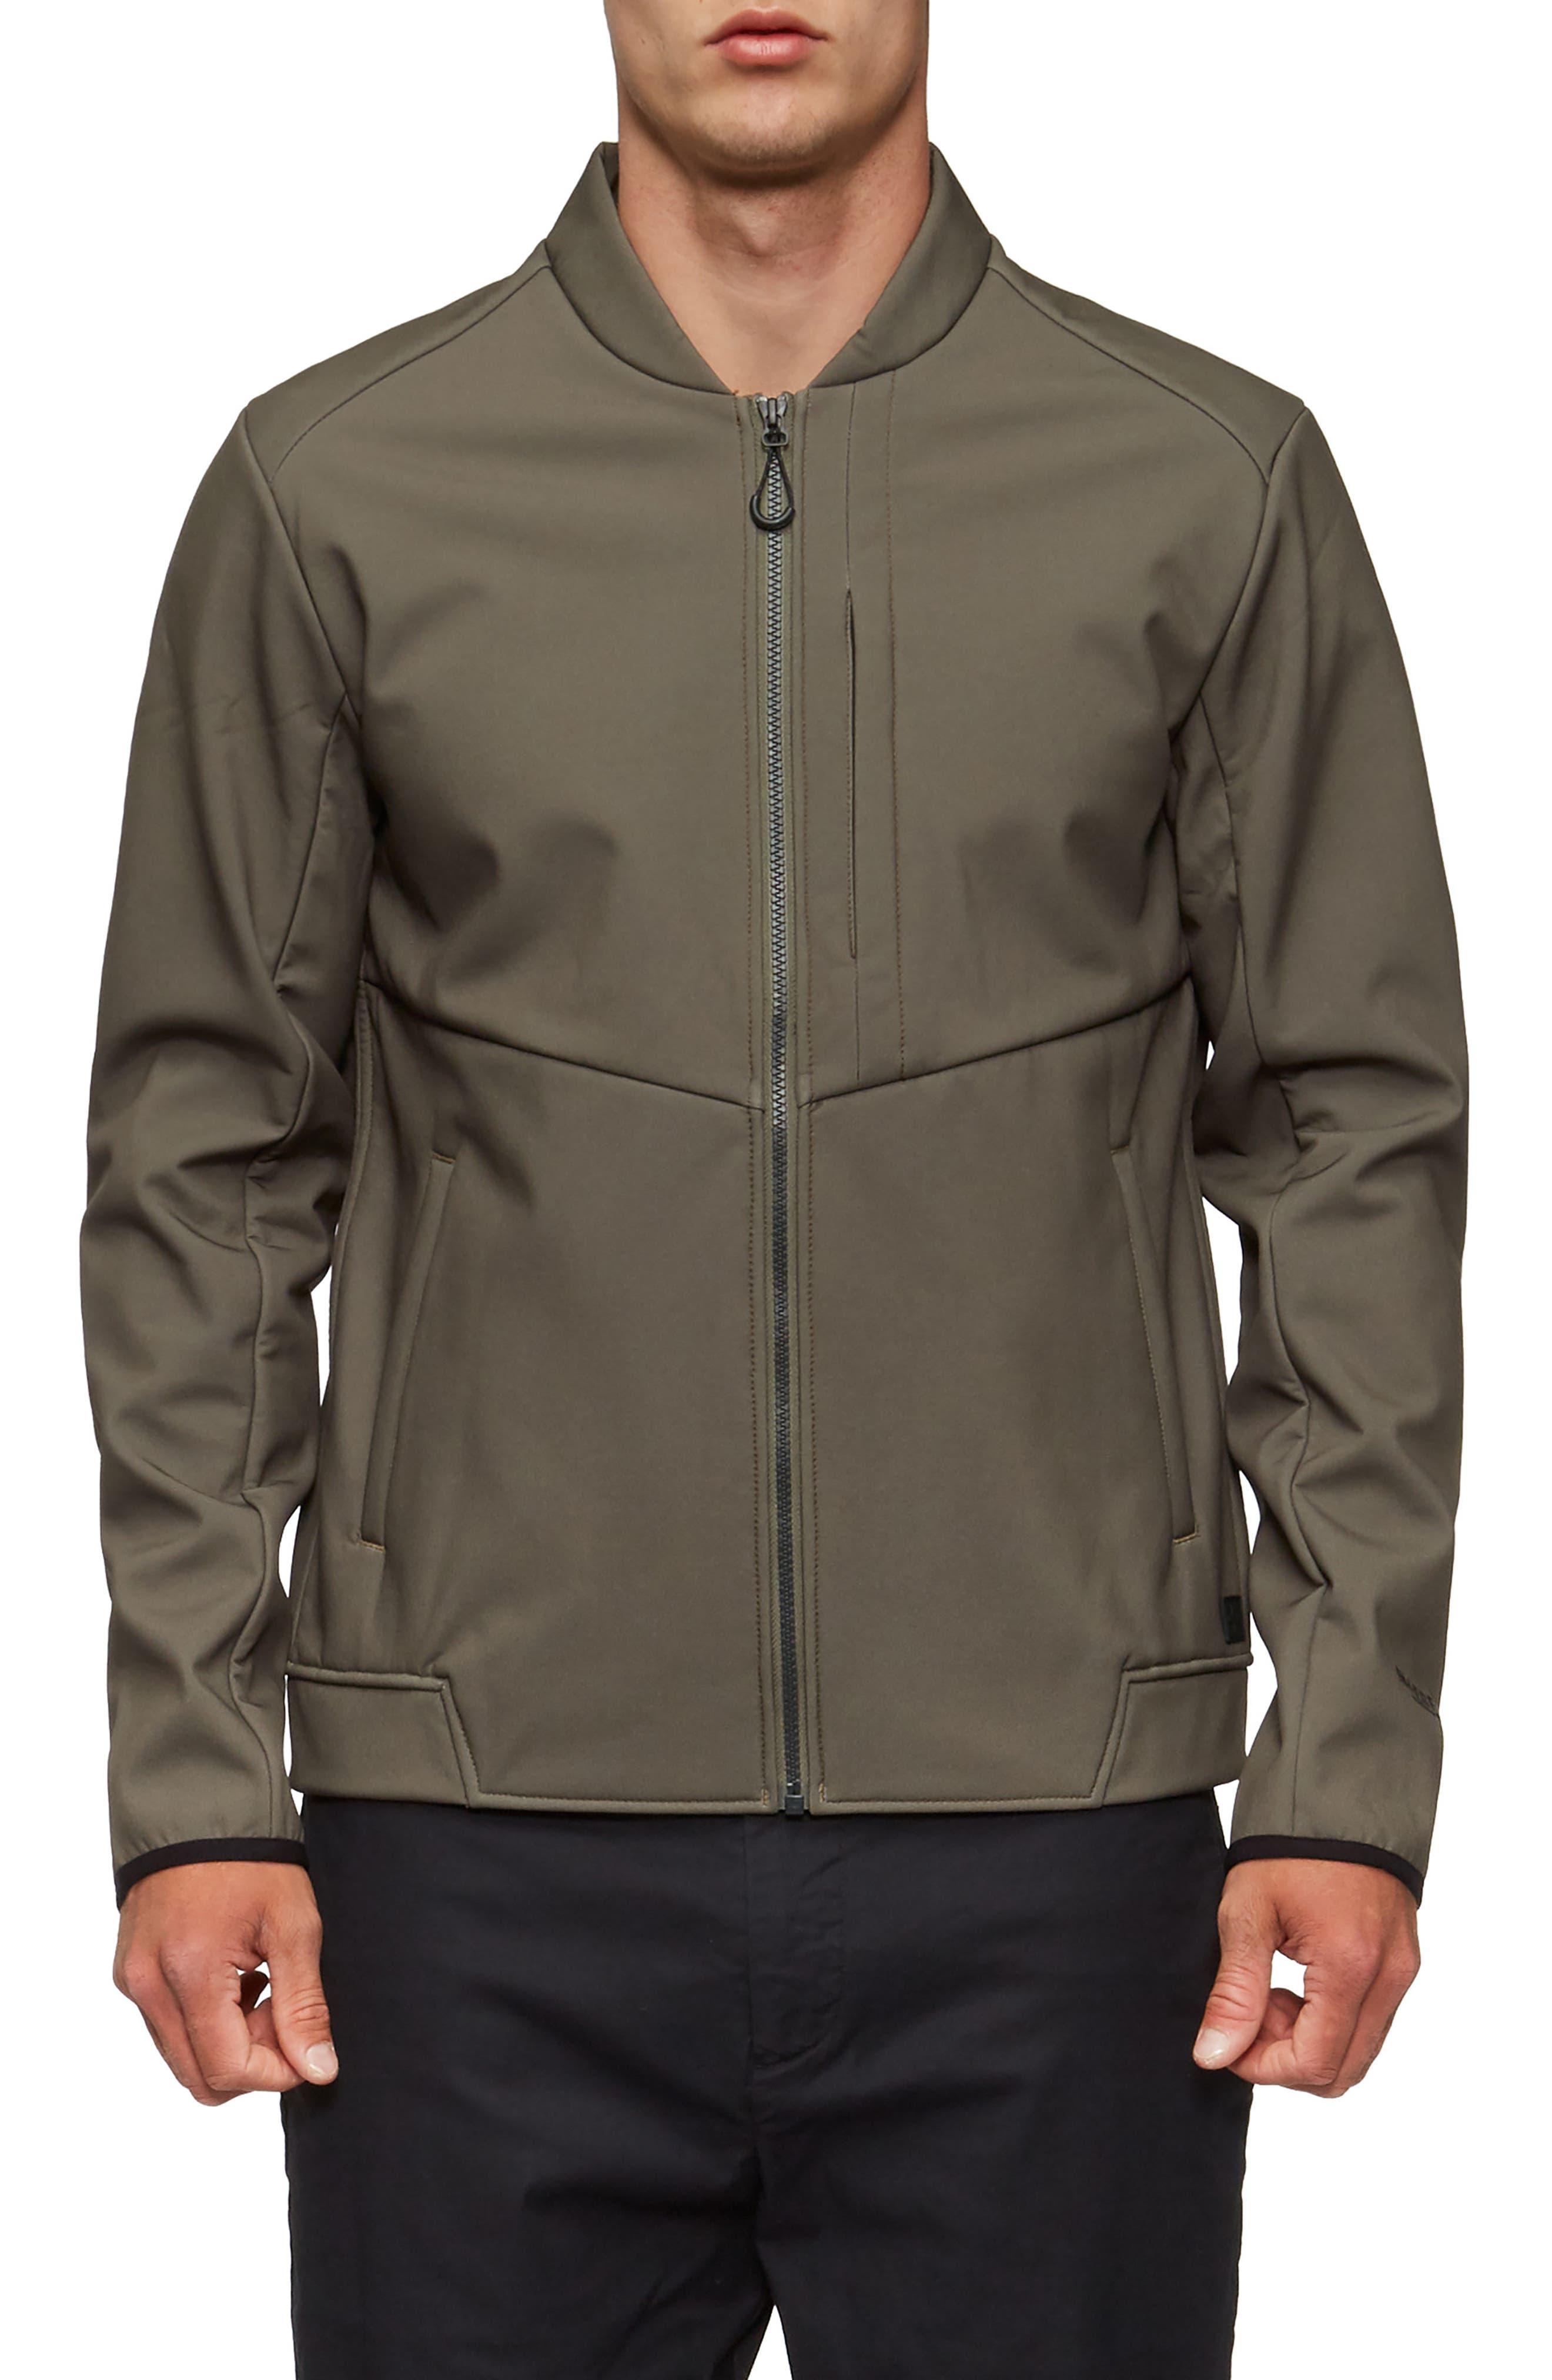 Main Image - TAVIK Decoy Fleece Jacket